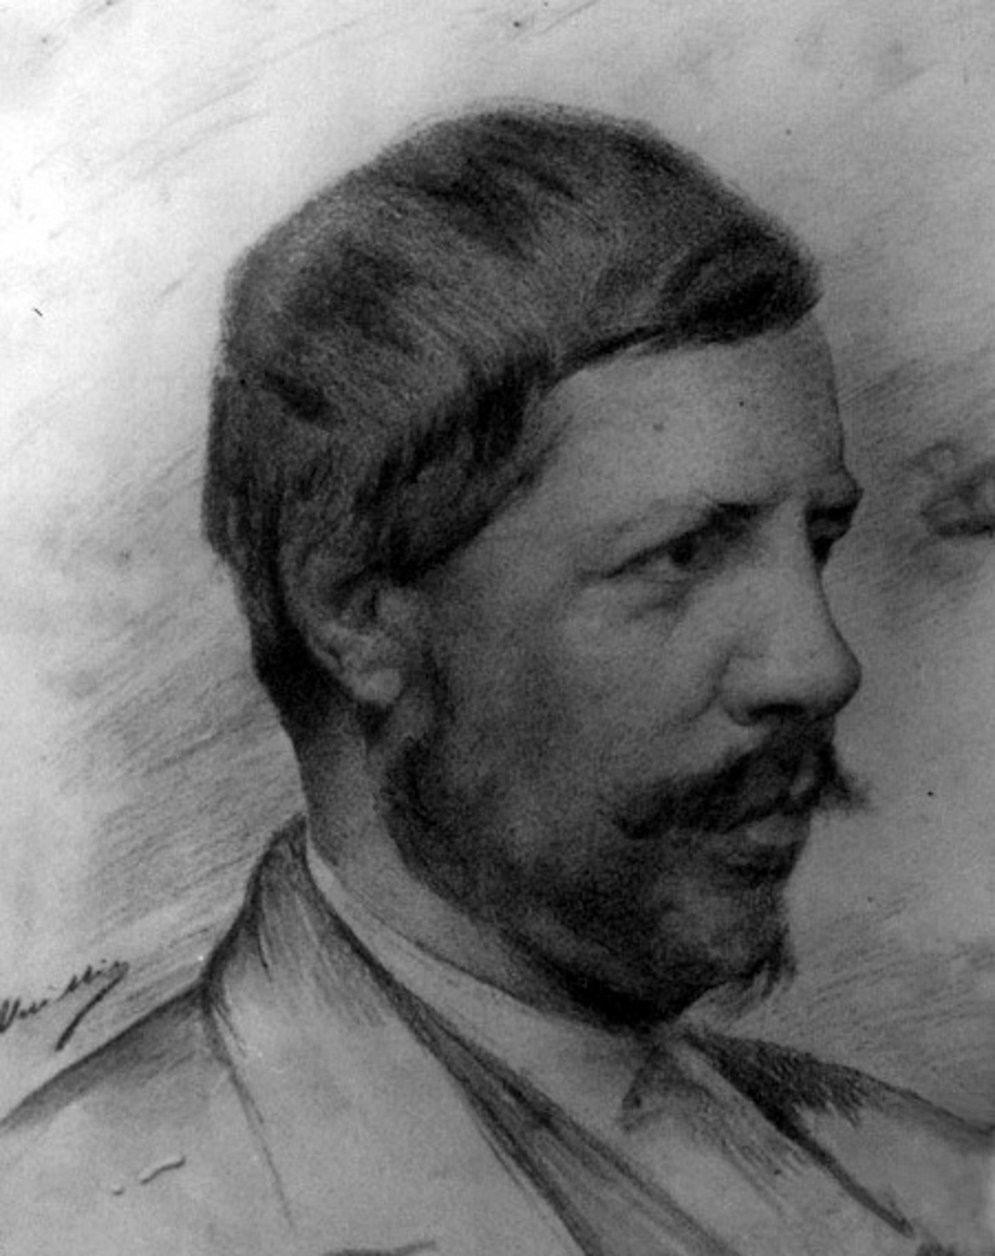 Erzherzog Ludwig Salvator